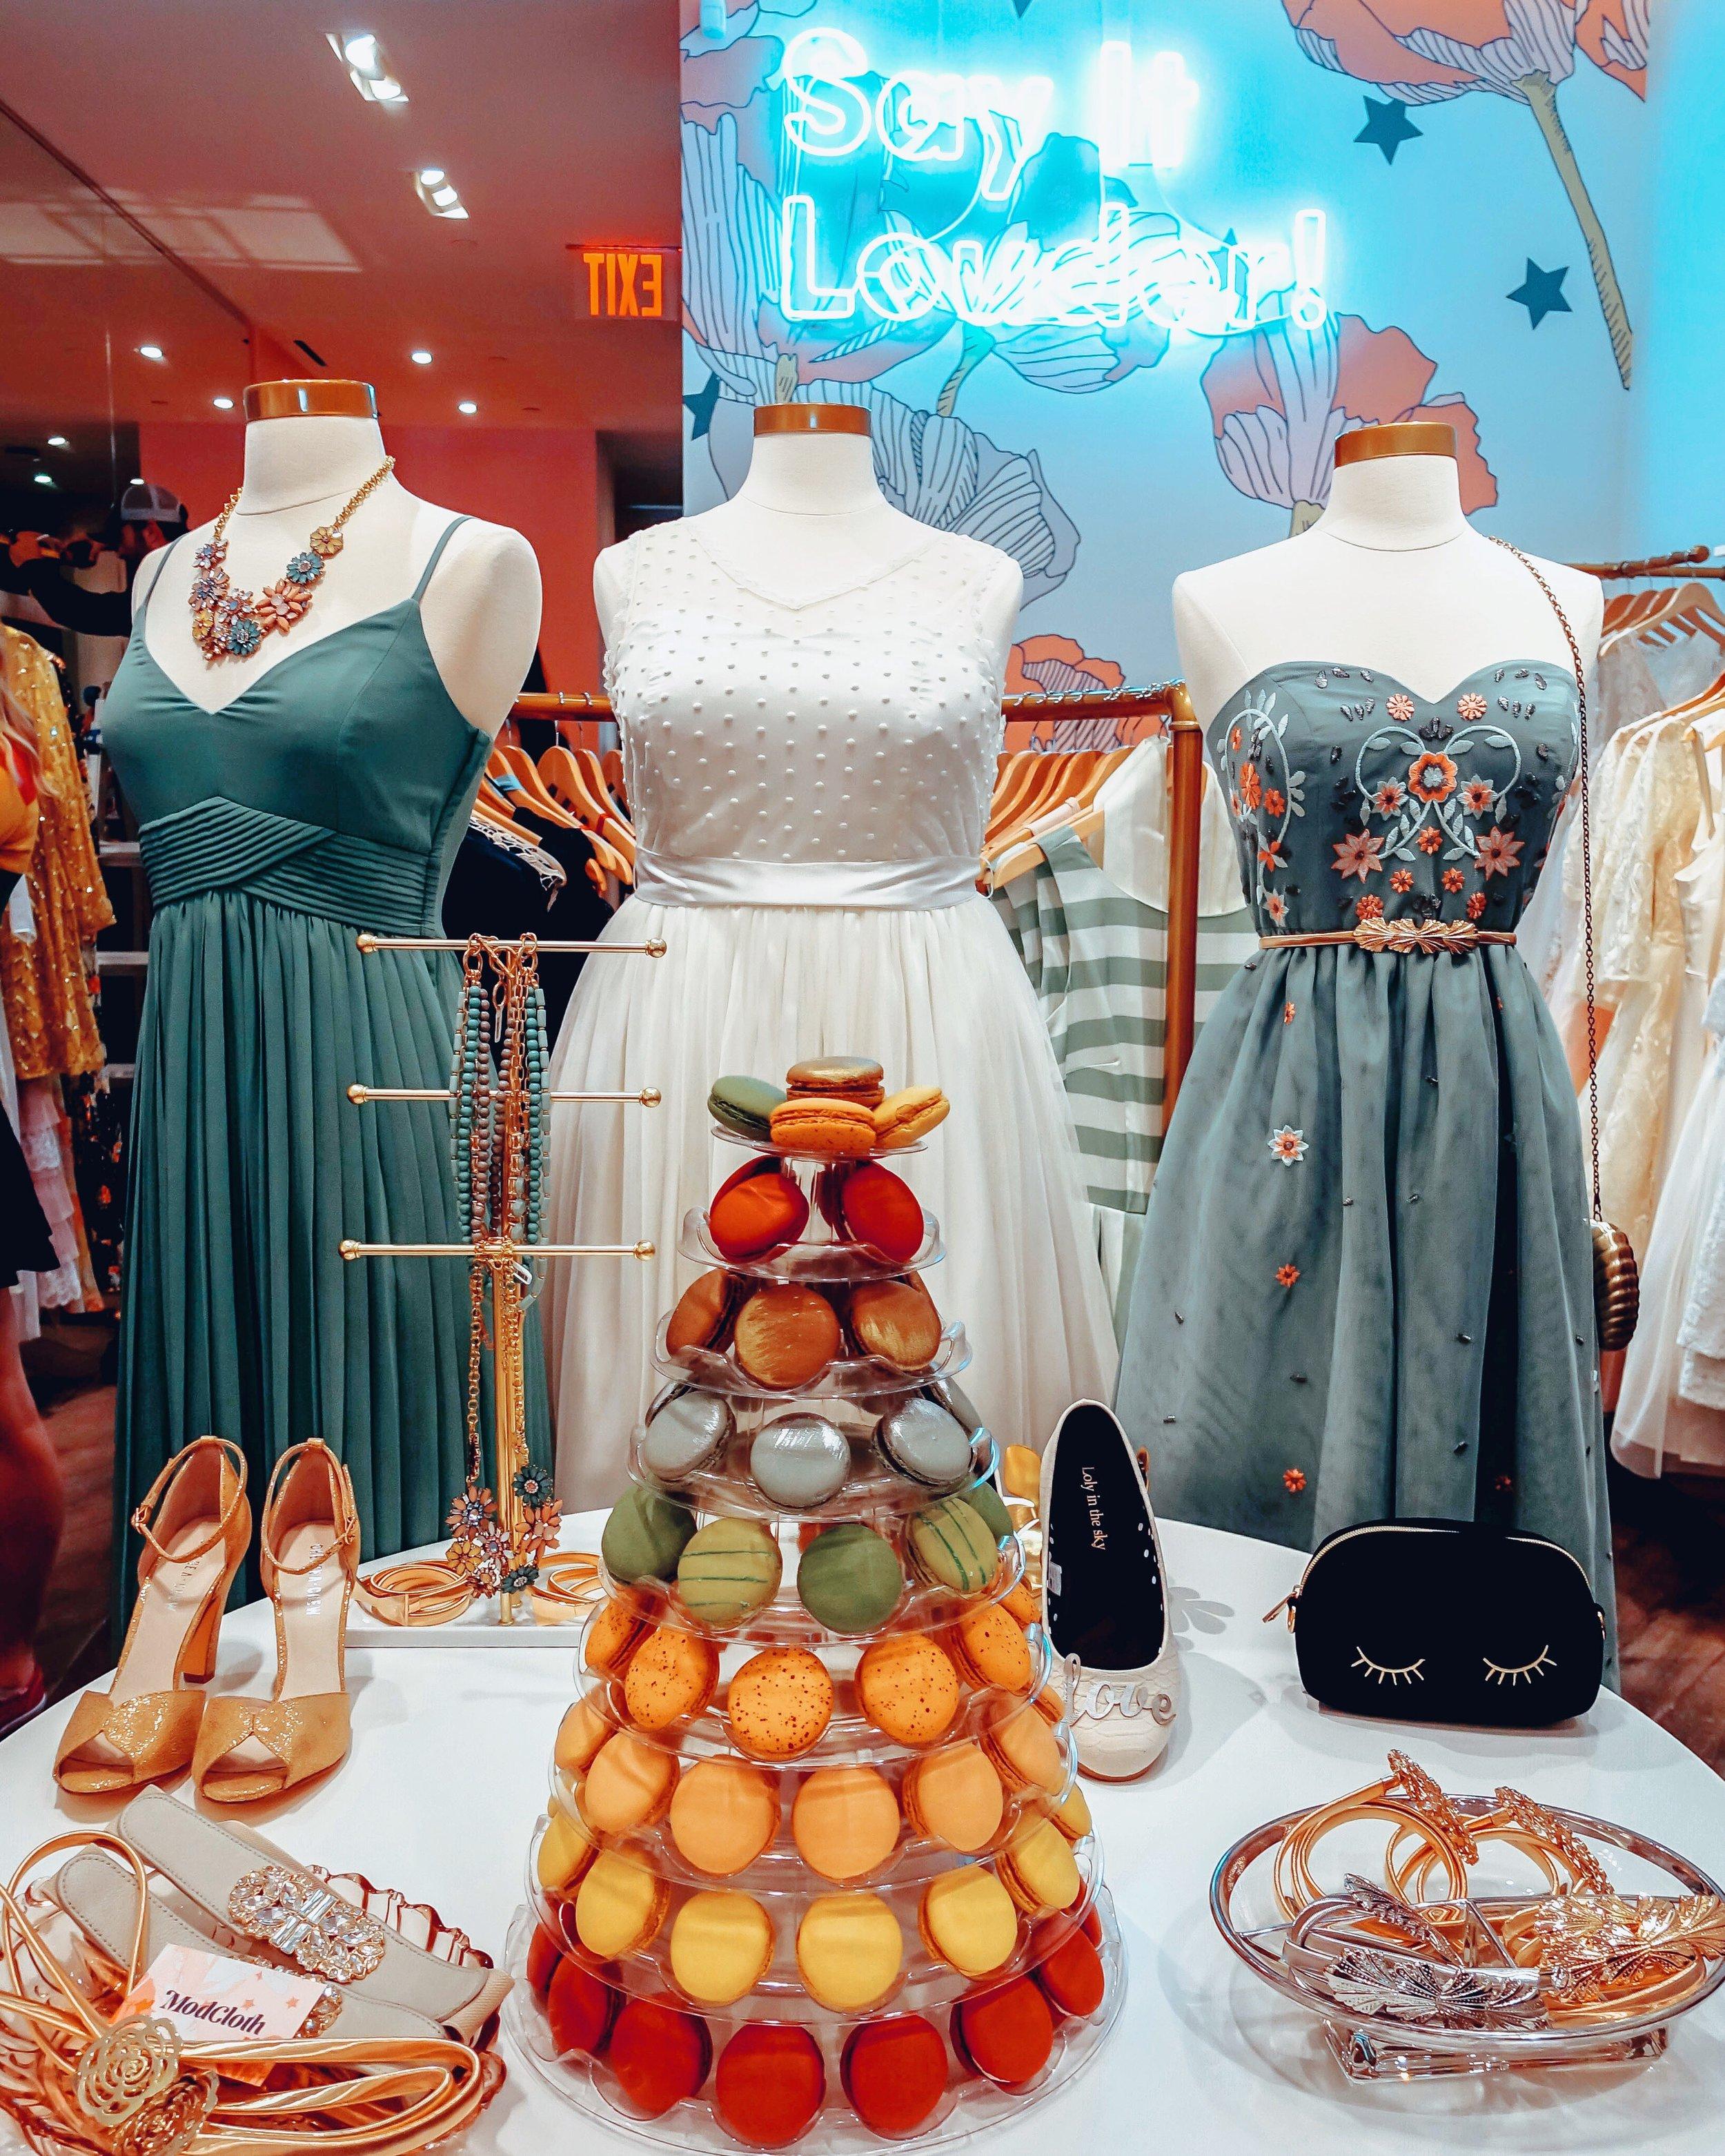 FashionbyAlly-ModCloth-SanFrancisco-Blog3.JPG